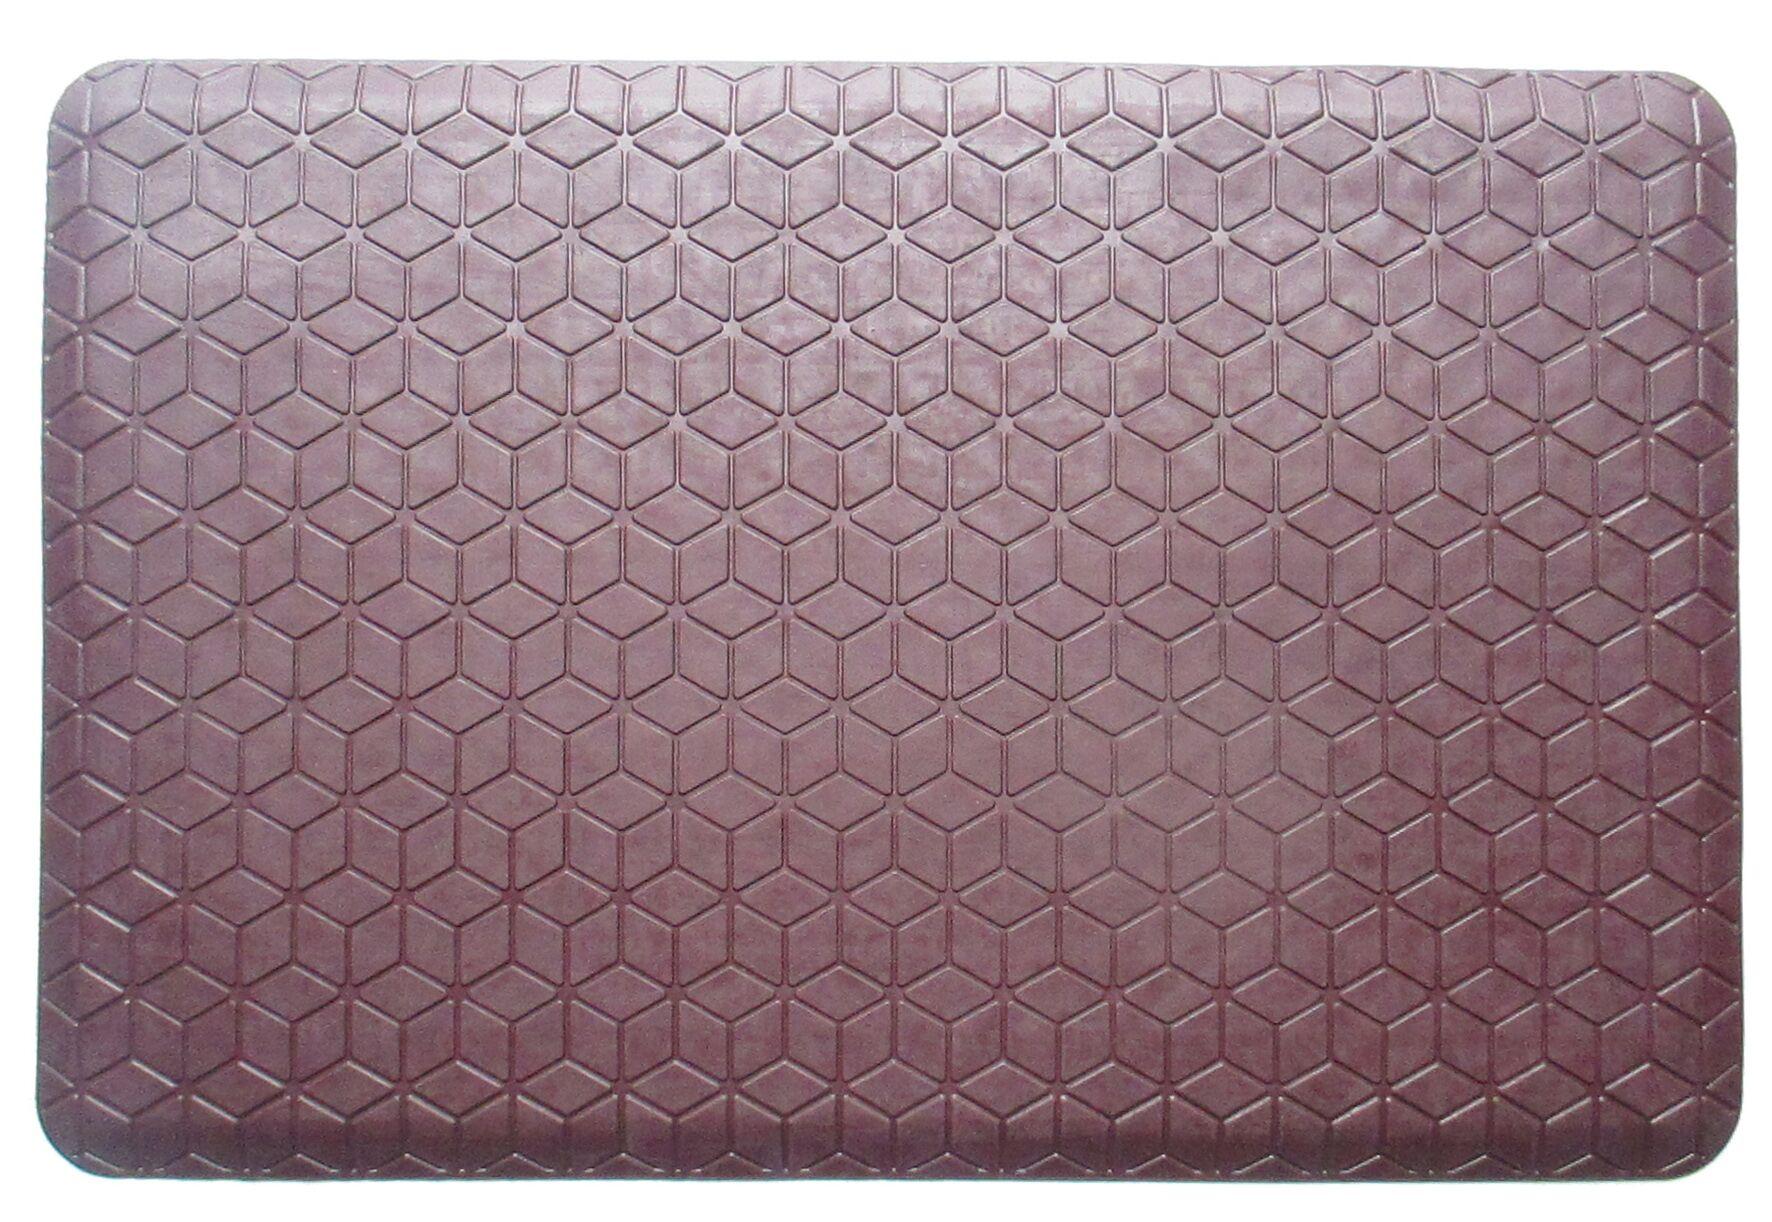 Shorewood Safety Grip Waterproof 100% Rubber Kitchen Mat Color: Burgandy